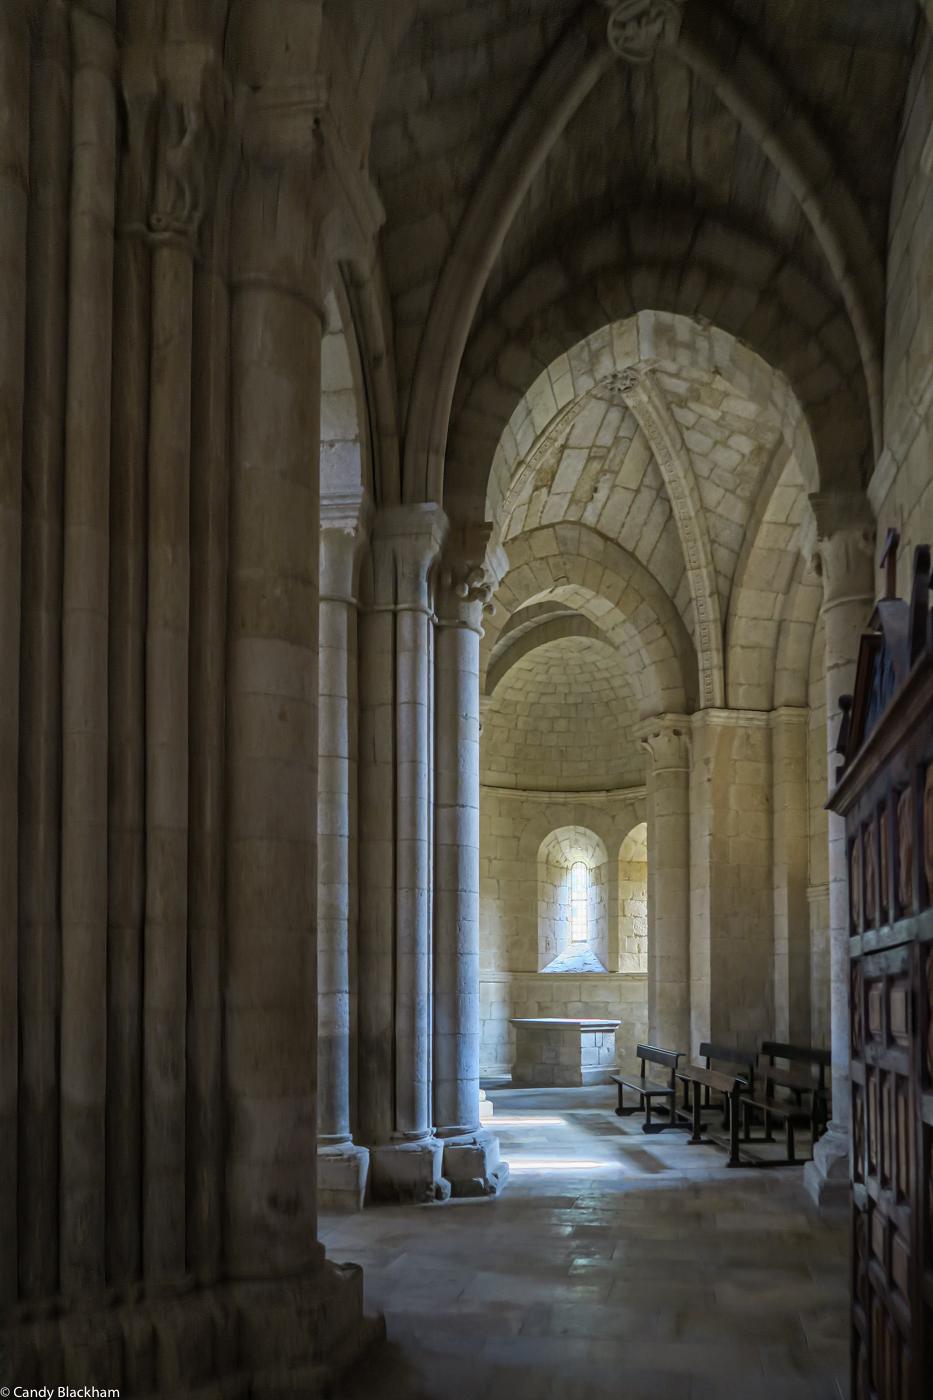 The Ambulatory of Santa Maria la Real in Gradefes